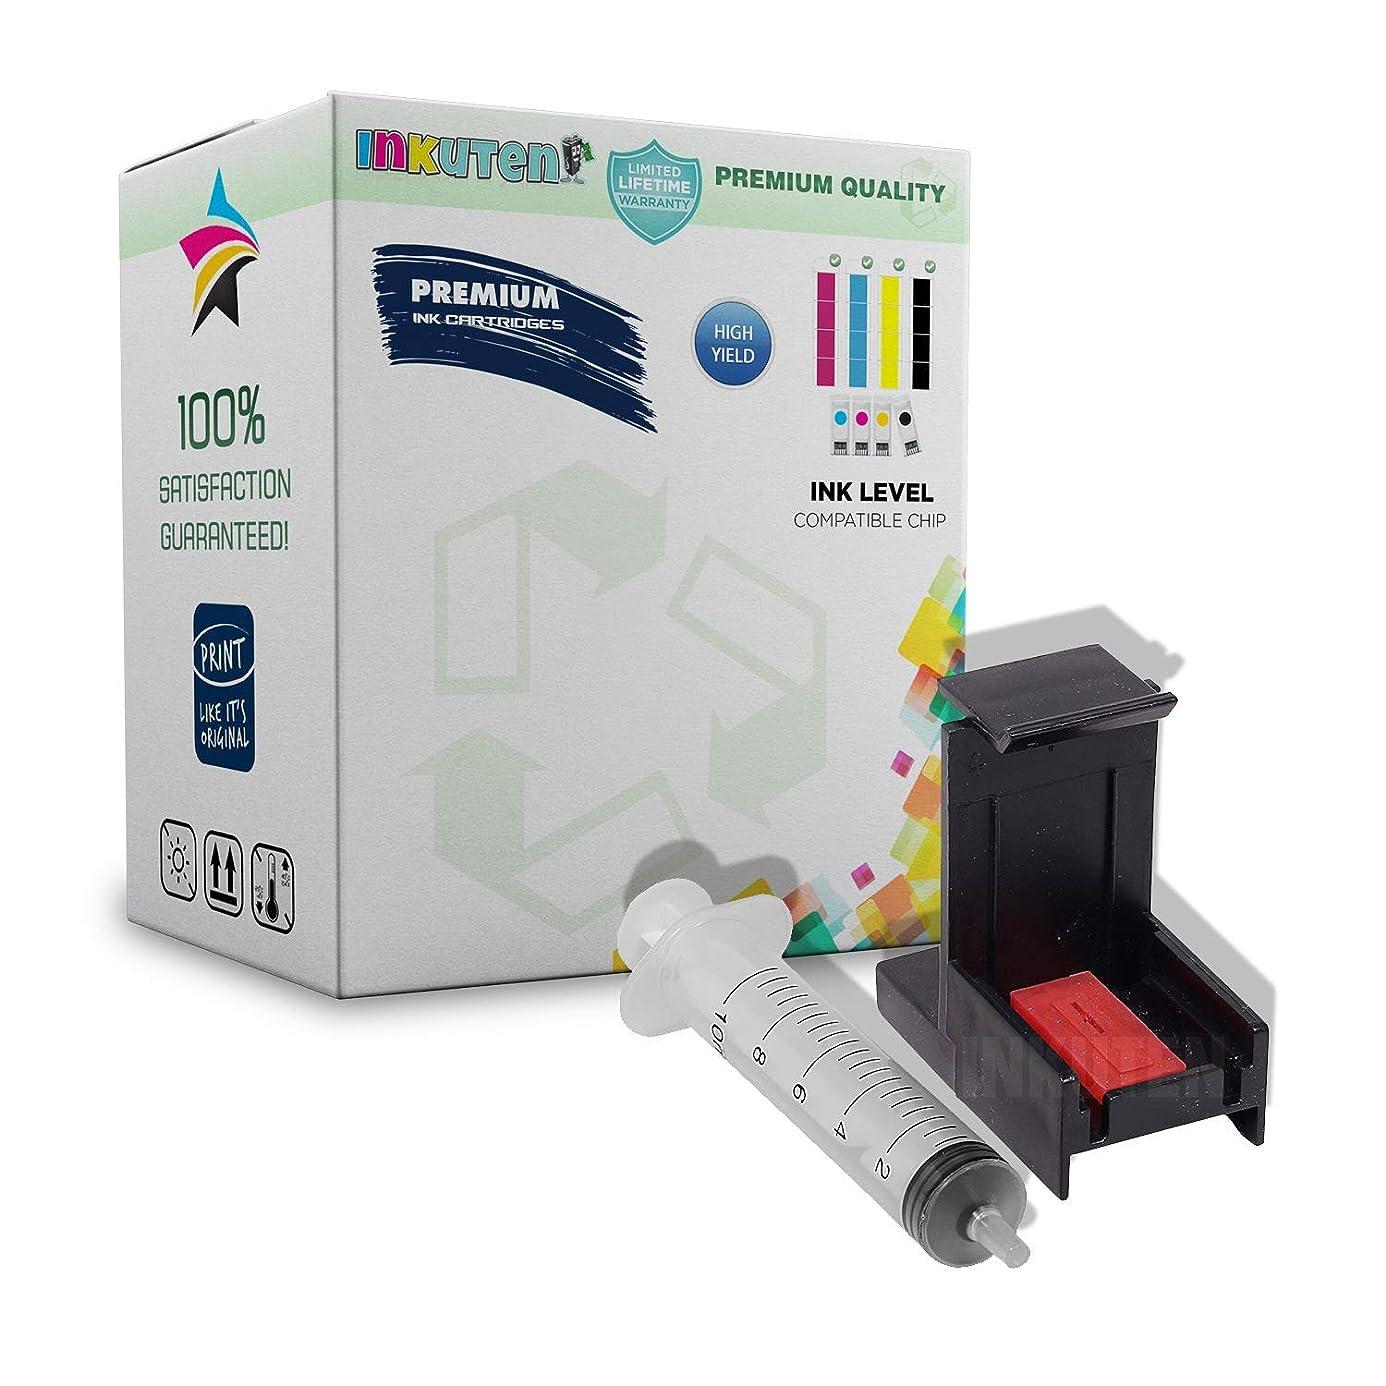 INKUTEN Ink Cartridge Suction Priming Clip for HP 63 61 62 65 64 56 57 21 22 96 97 98 93 92 27 60 Black and Color Inkjet Cartridges znk2635521